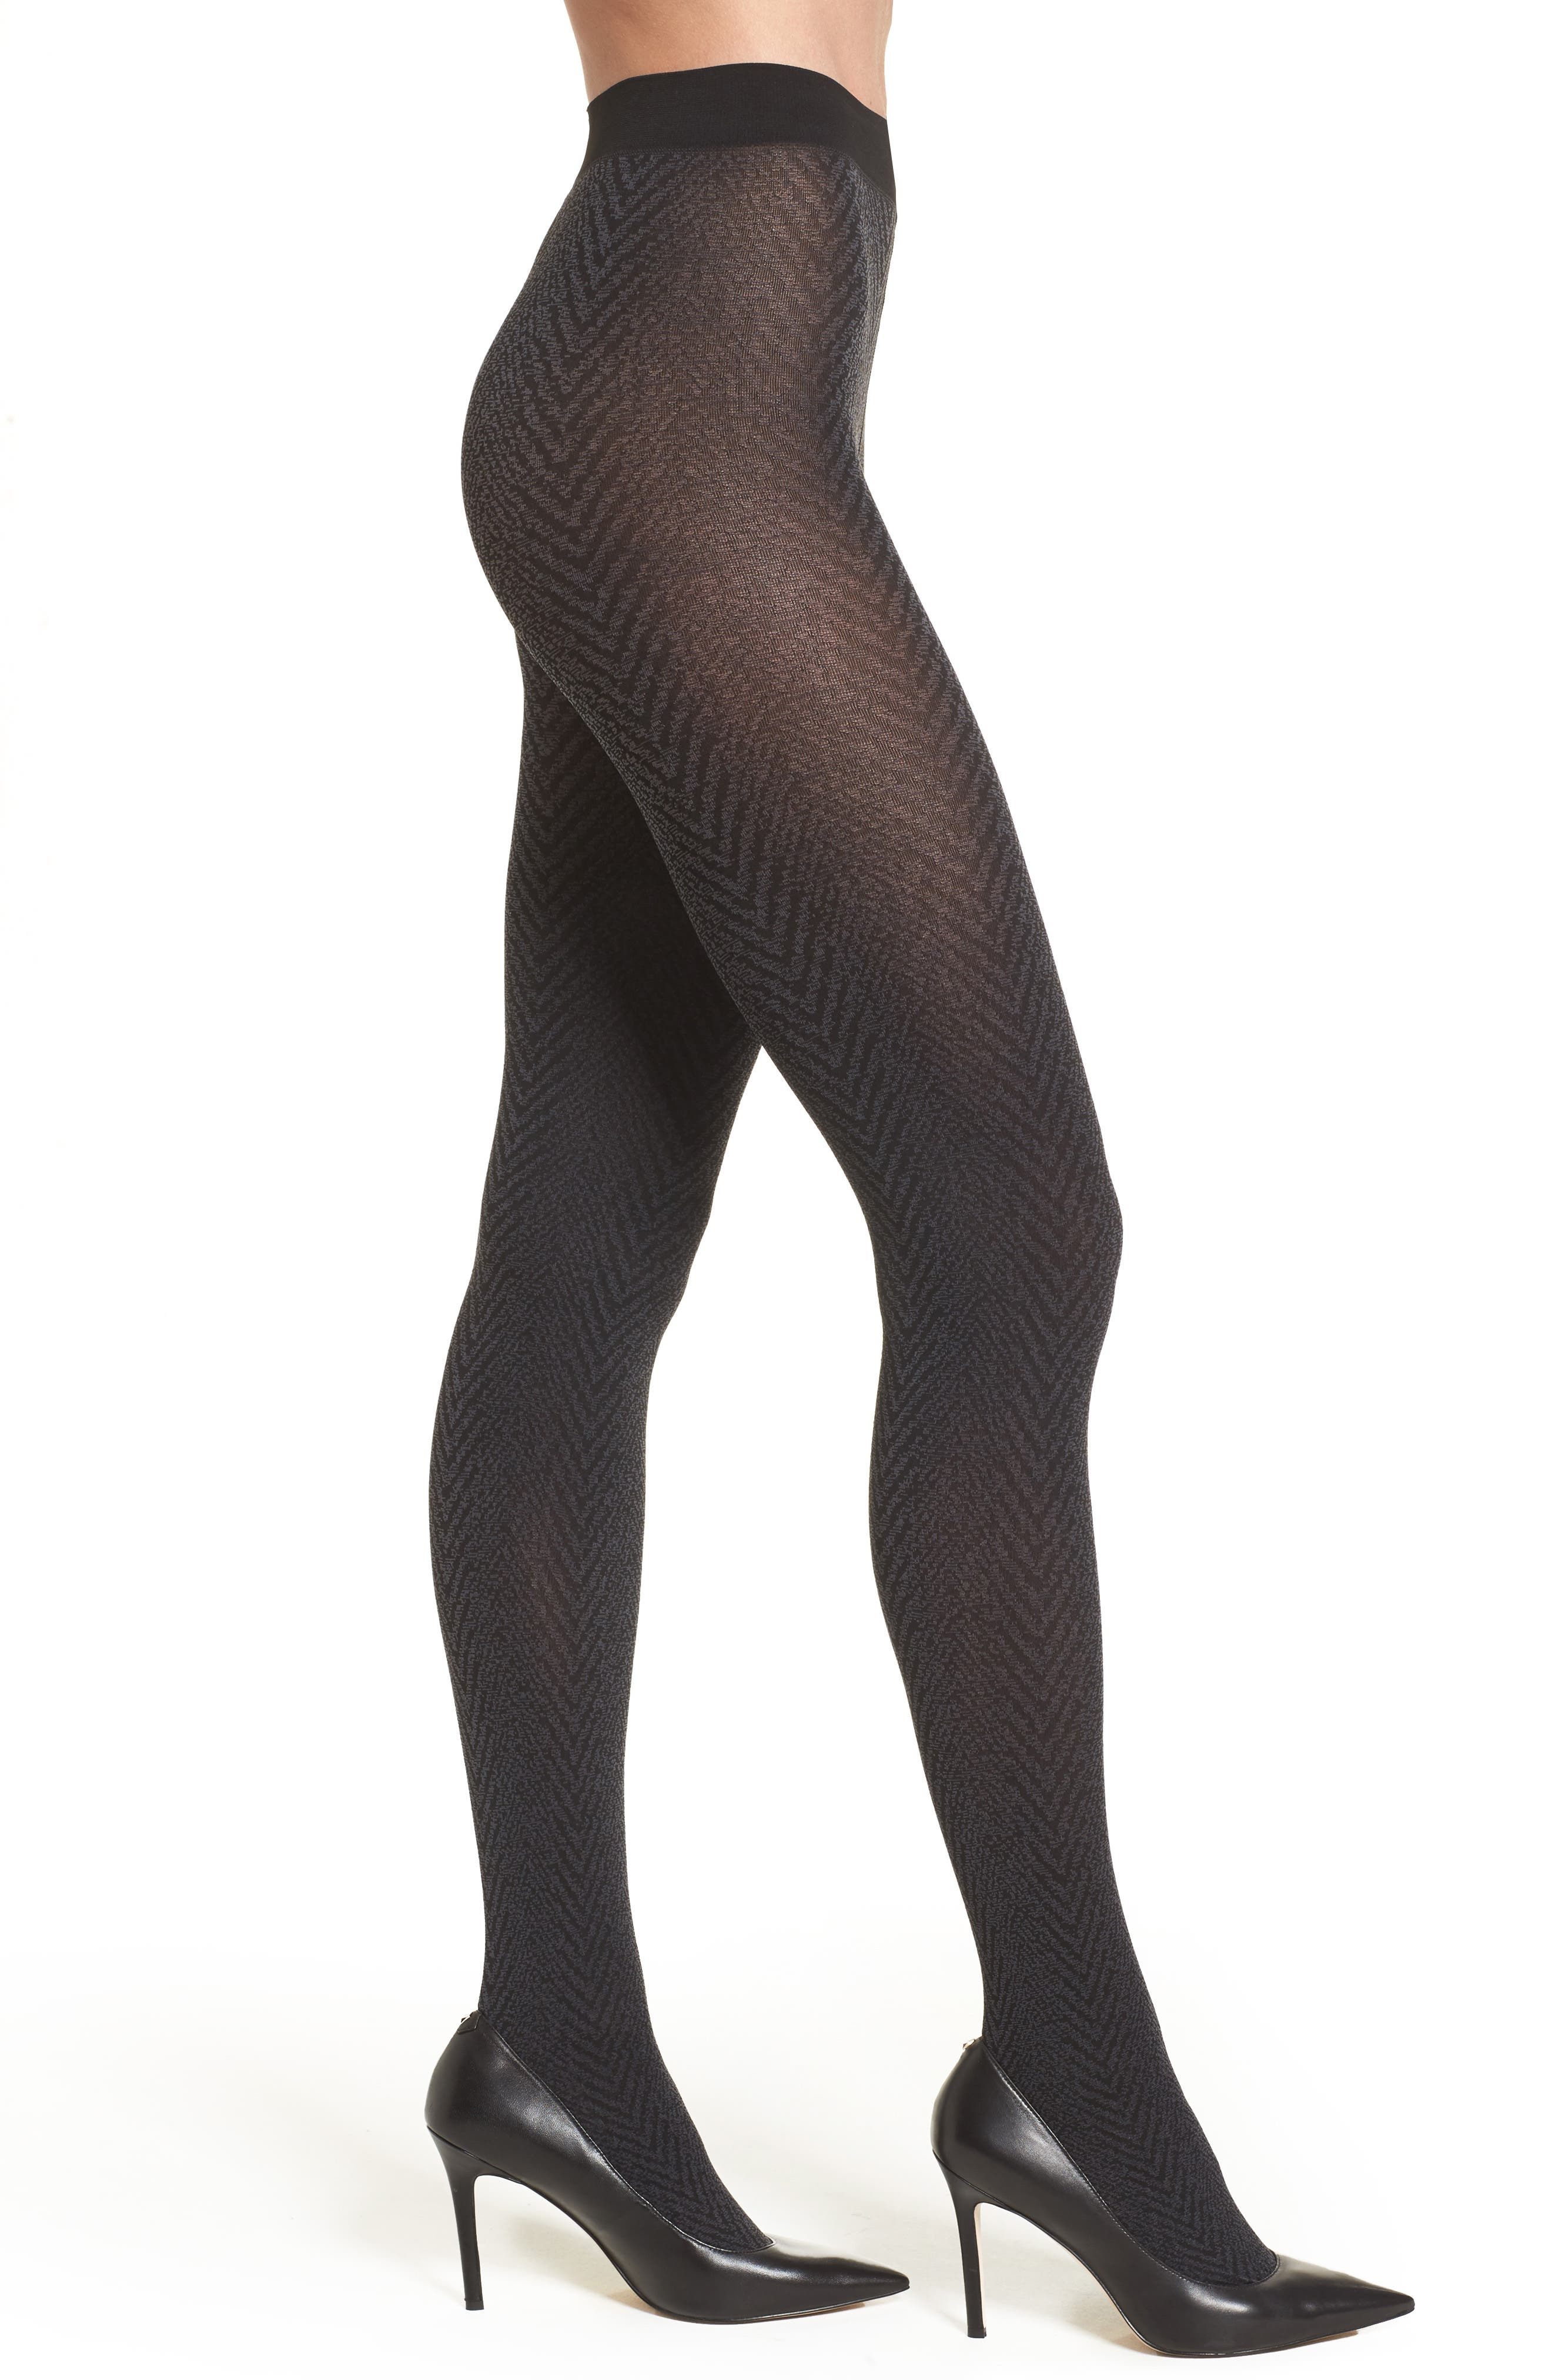 Blanca Herringbone Tights,                         Main,                         color, Black